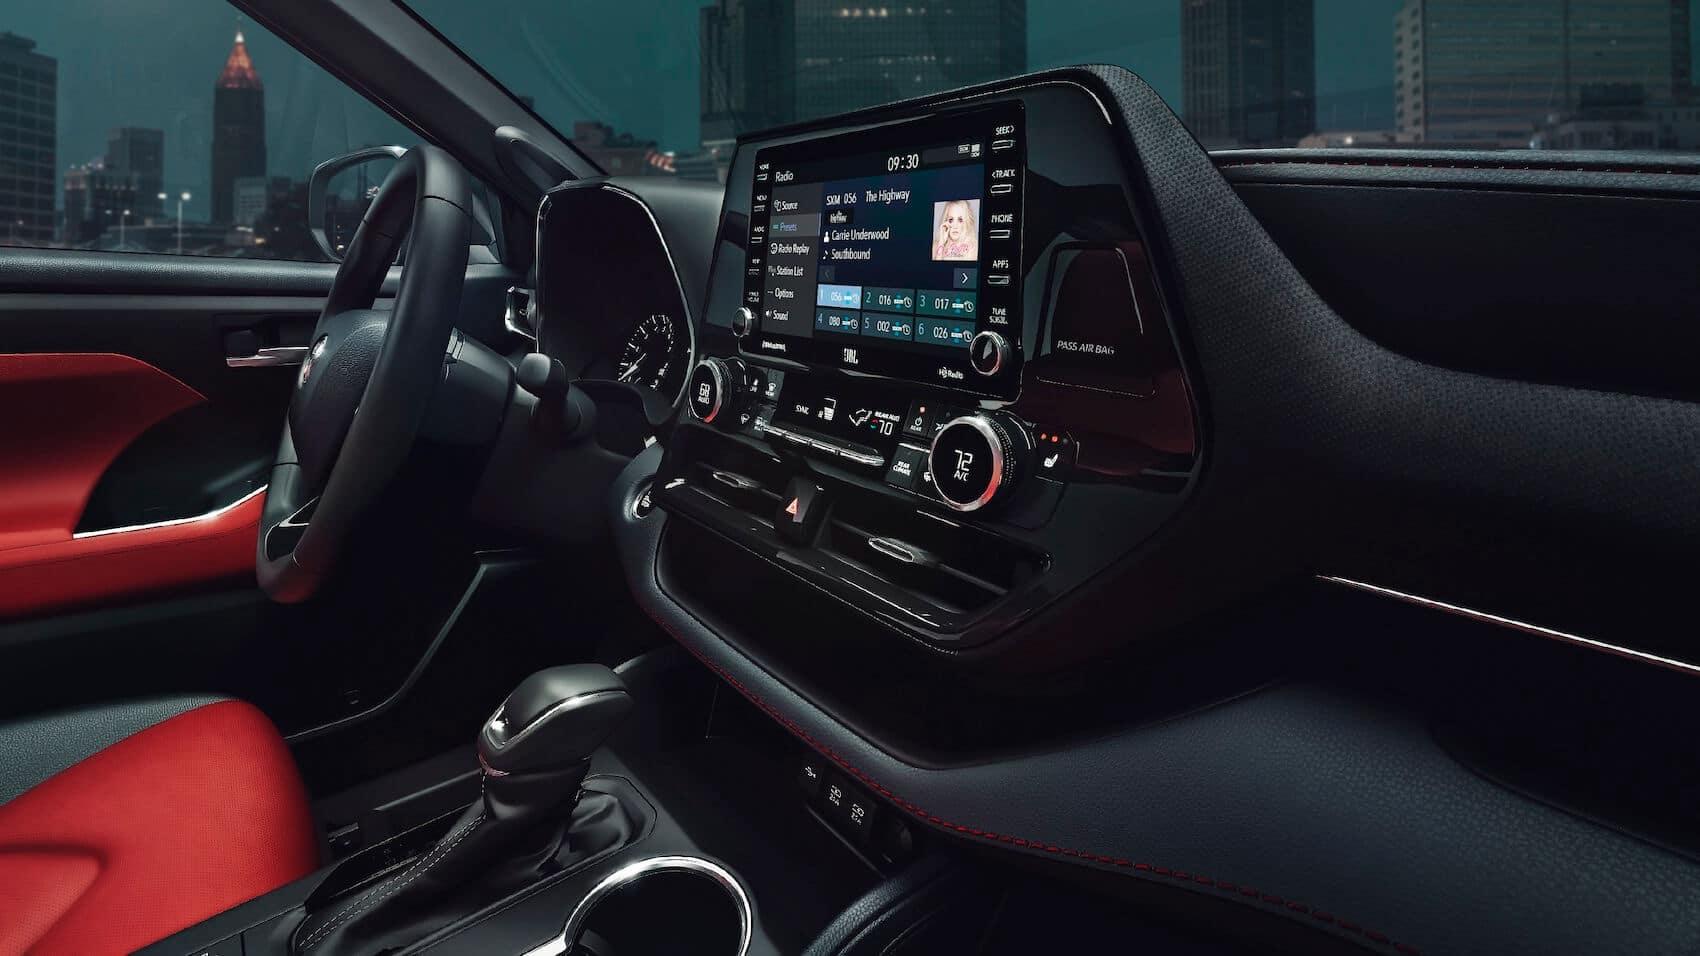 Toyota Highlander Tech